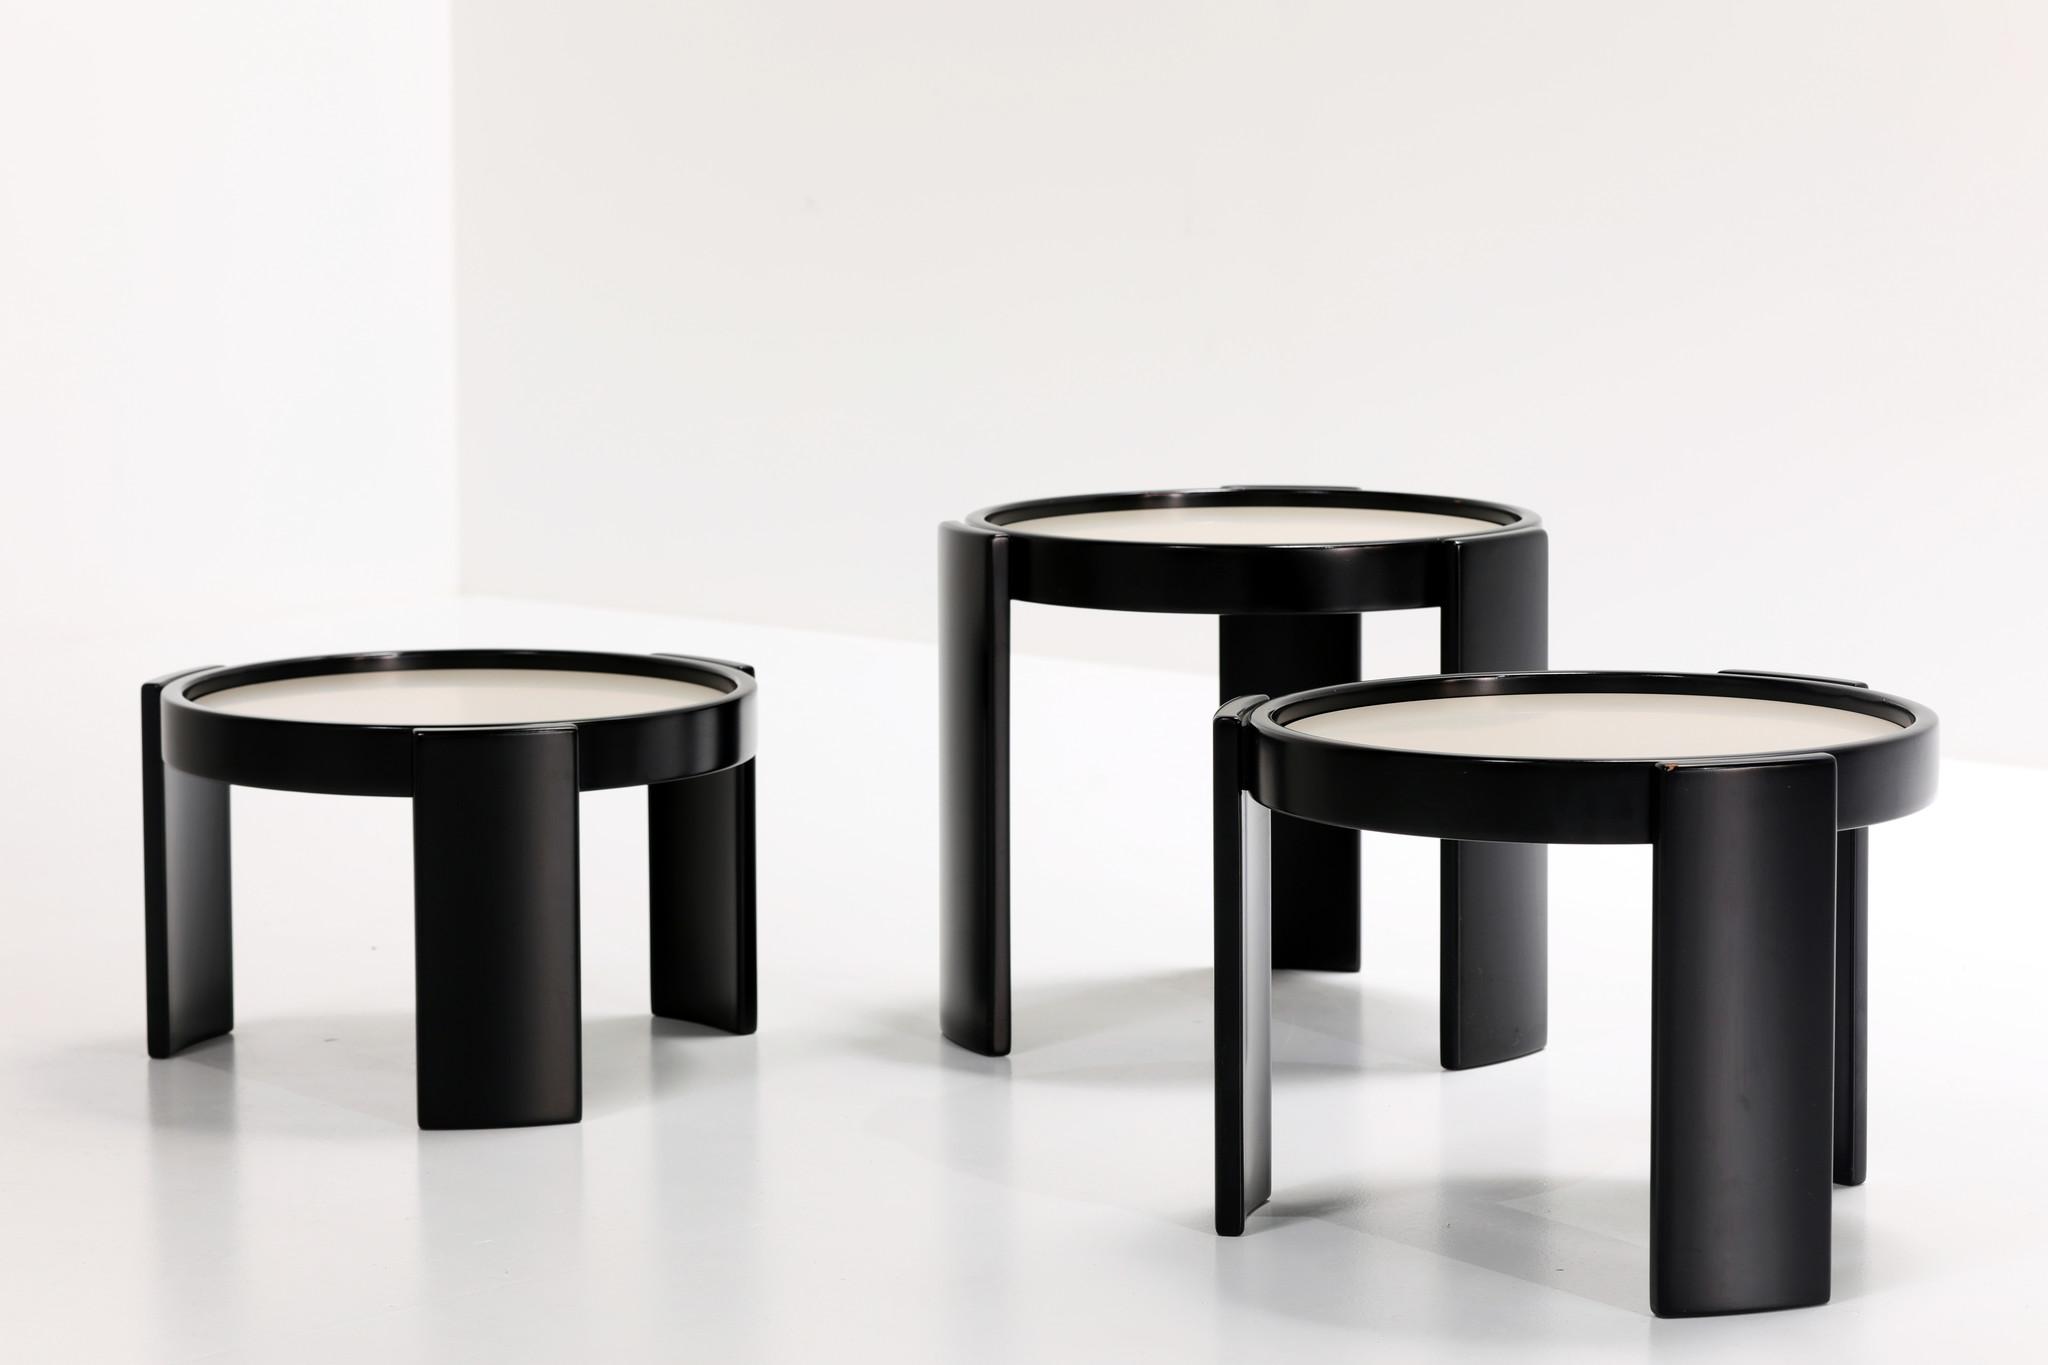 GIANFRANCO FRATTINI LOW TABLE SET FOR CASSINA, 1966